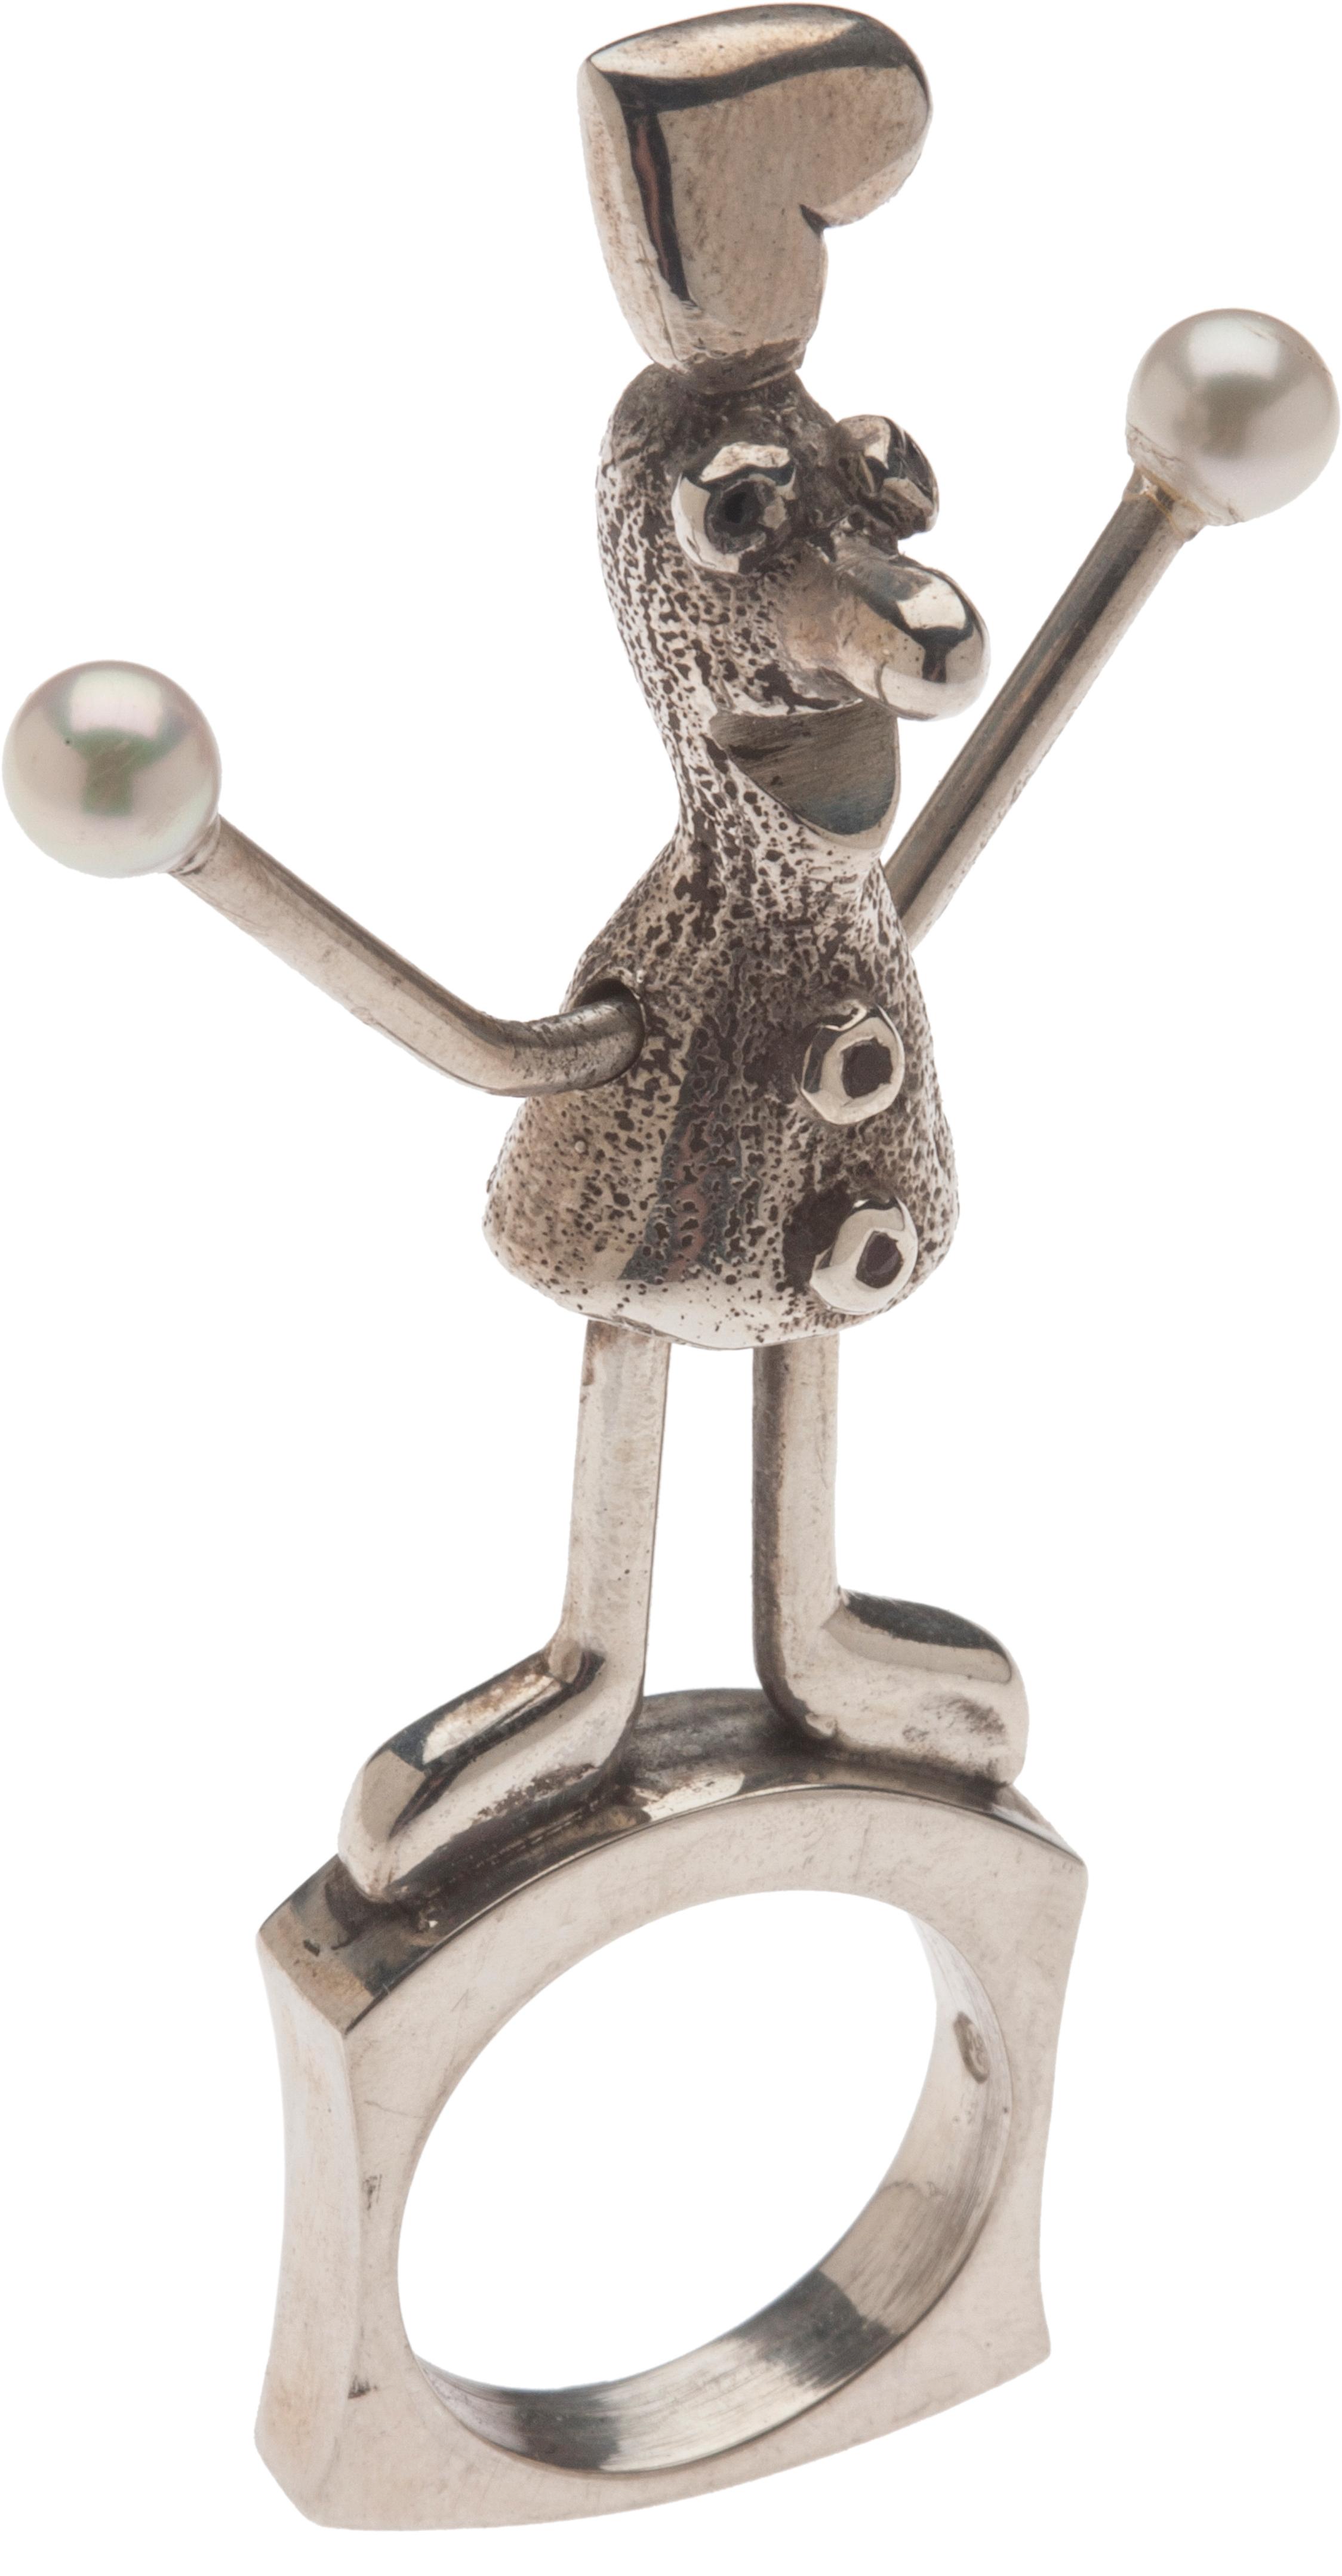 "sterling silver, pearls, inset jewels  3"" x 1.63"" x .63"""